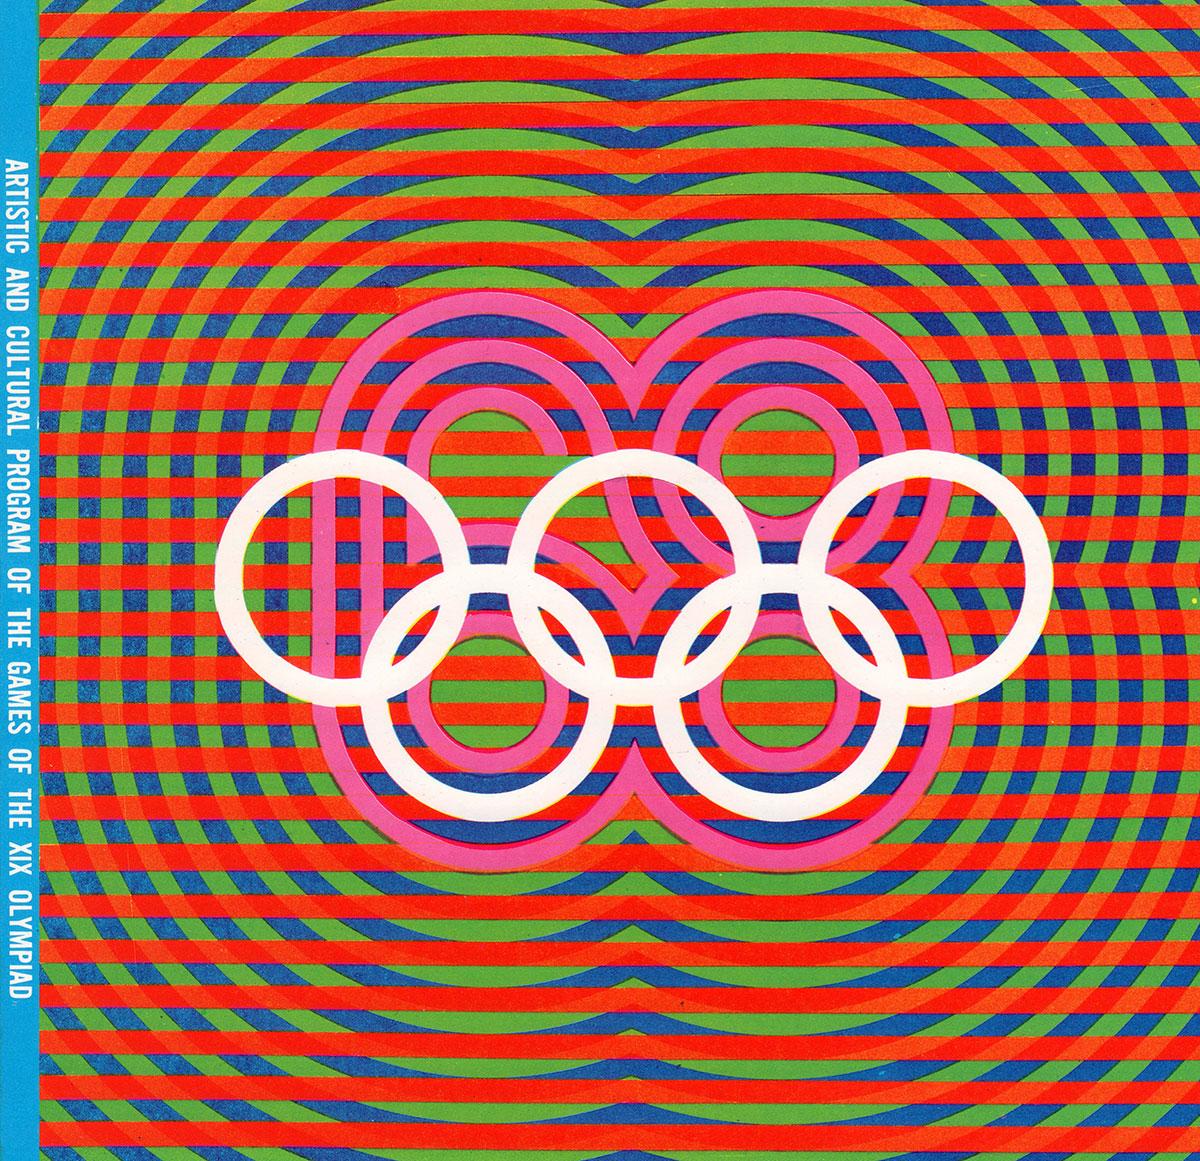 Wyman_Mex'68-CulturalProgramCover